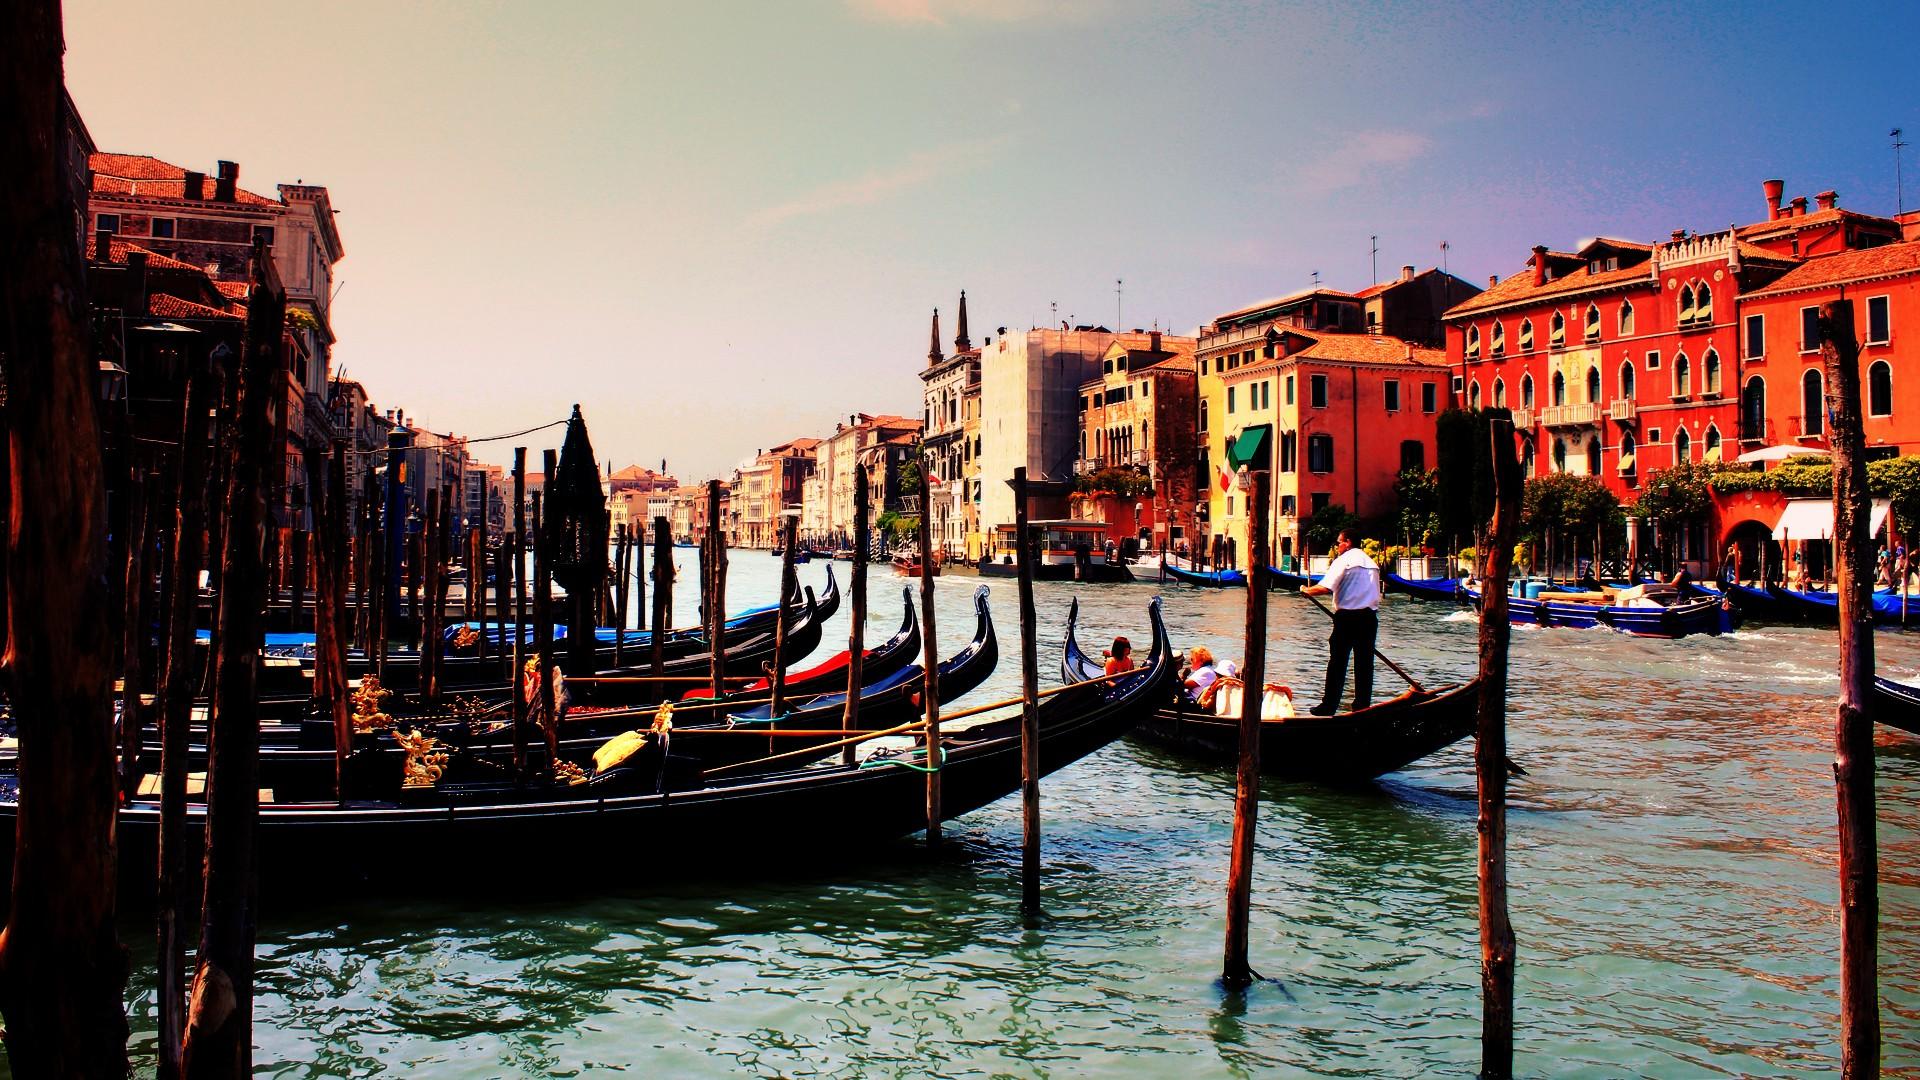 Hd wallpaper europe - Venice Wallpaper Full Hd 1080p Italy Hd Desktop Wallpapers